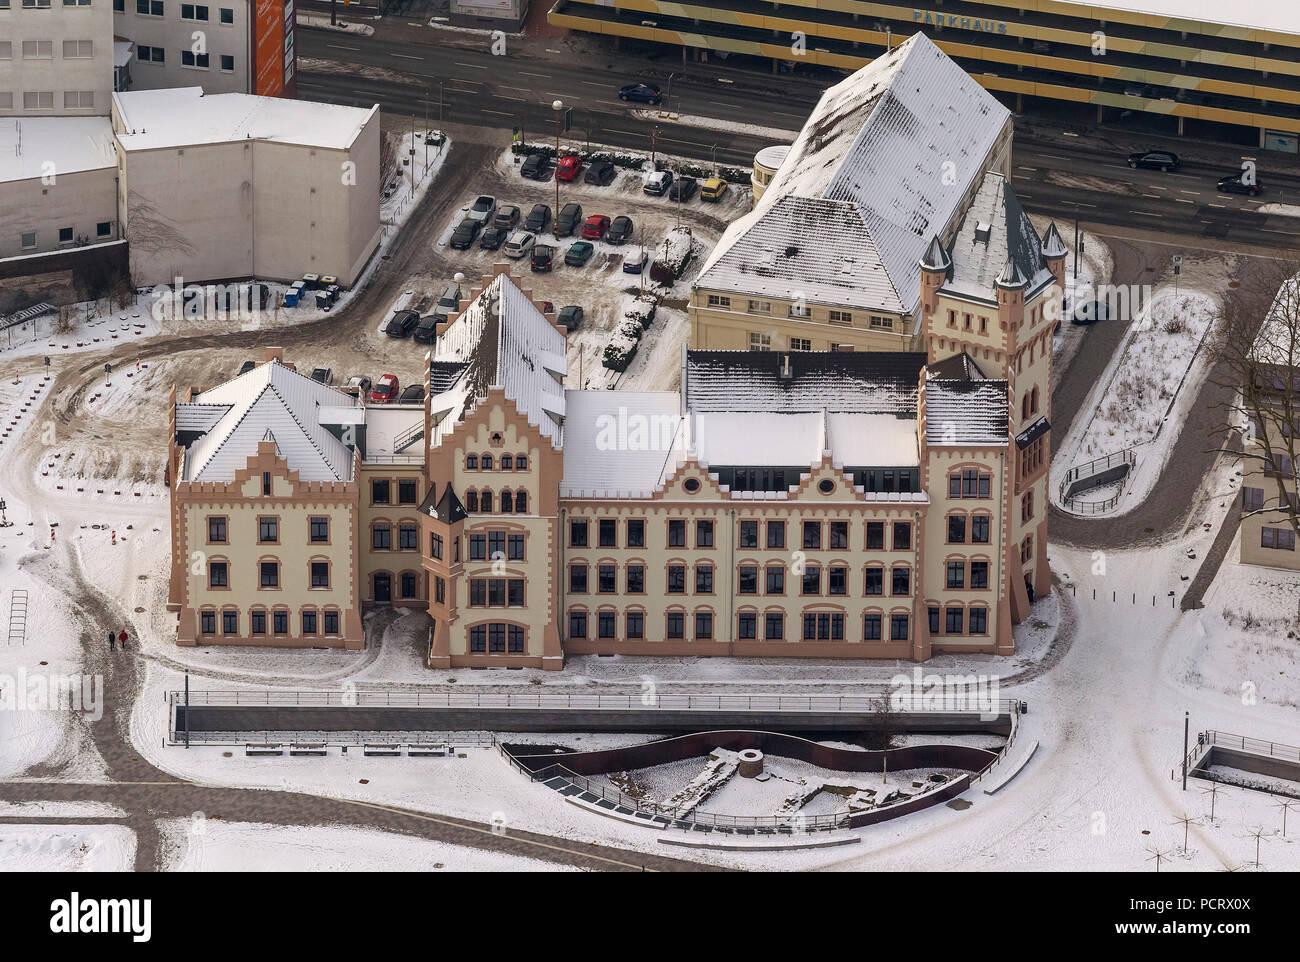 Aerial view, Hörder Castle, Phoenixsee, former steelwork Dortmund Hörde, Dortmund, Ruhr area, North Rhine-Westphalia, Germany, Europe - Stock Image